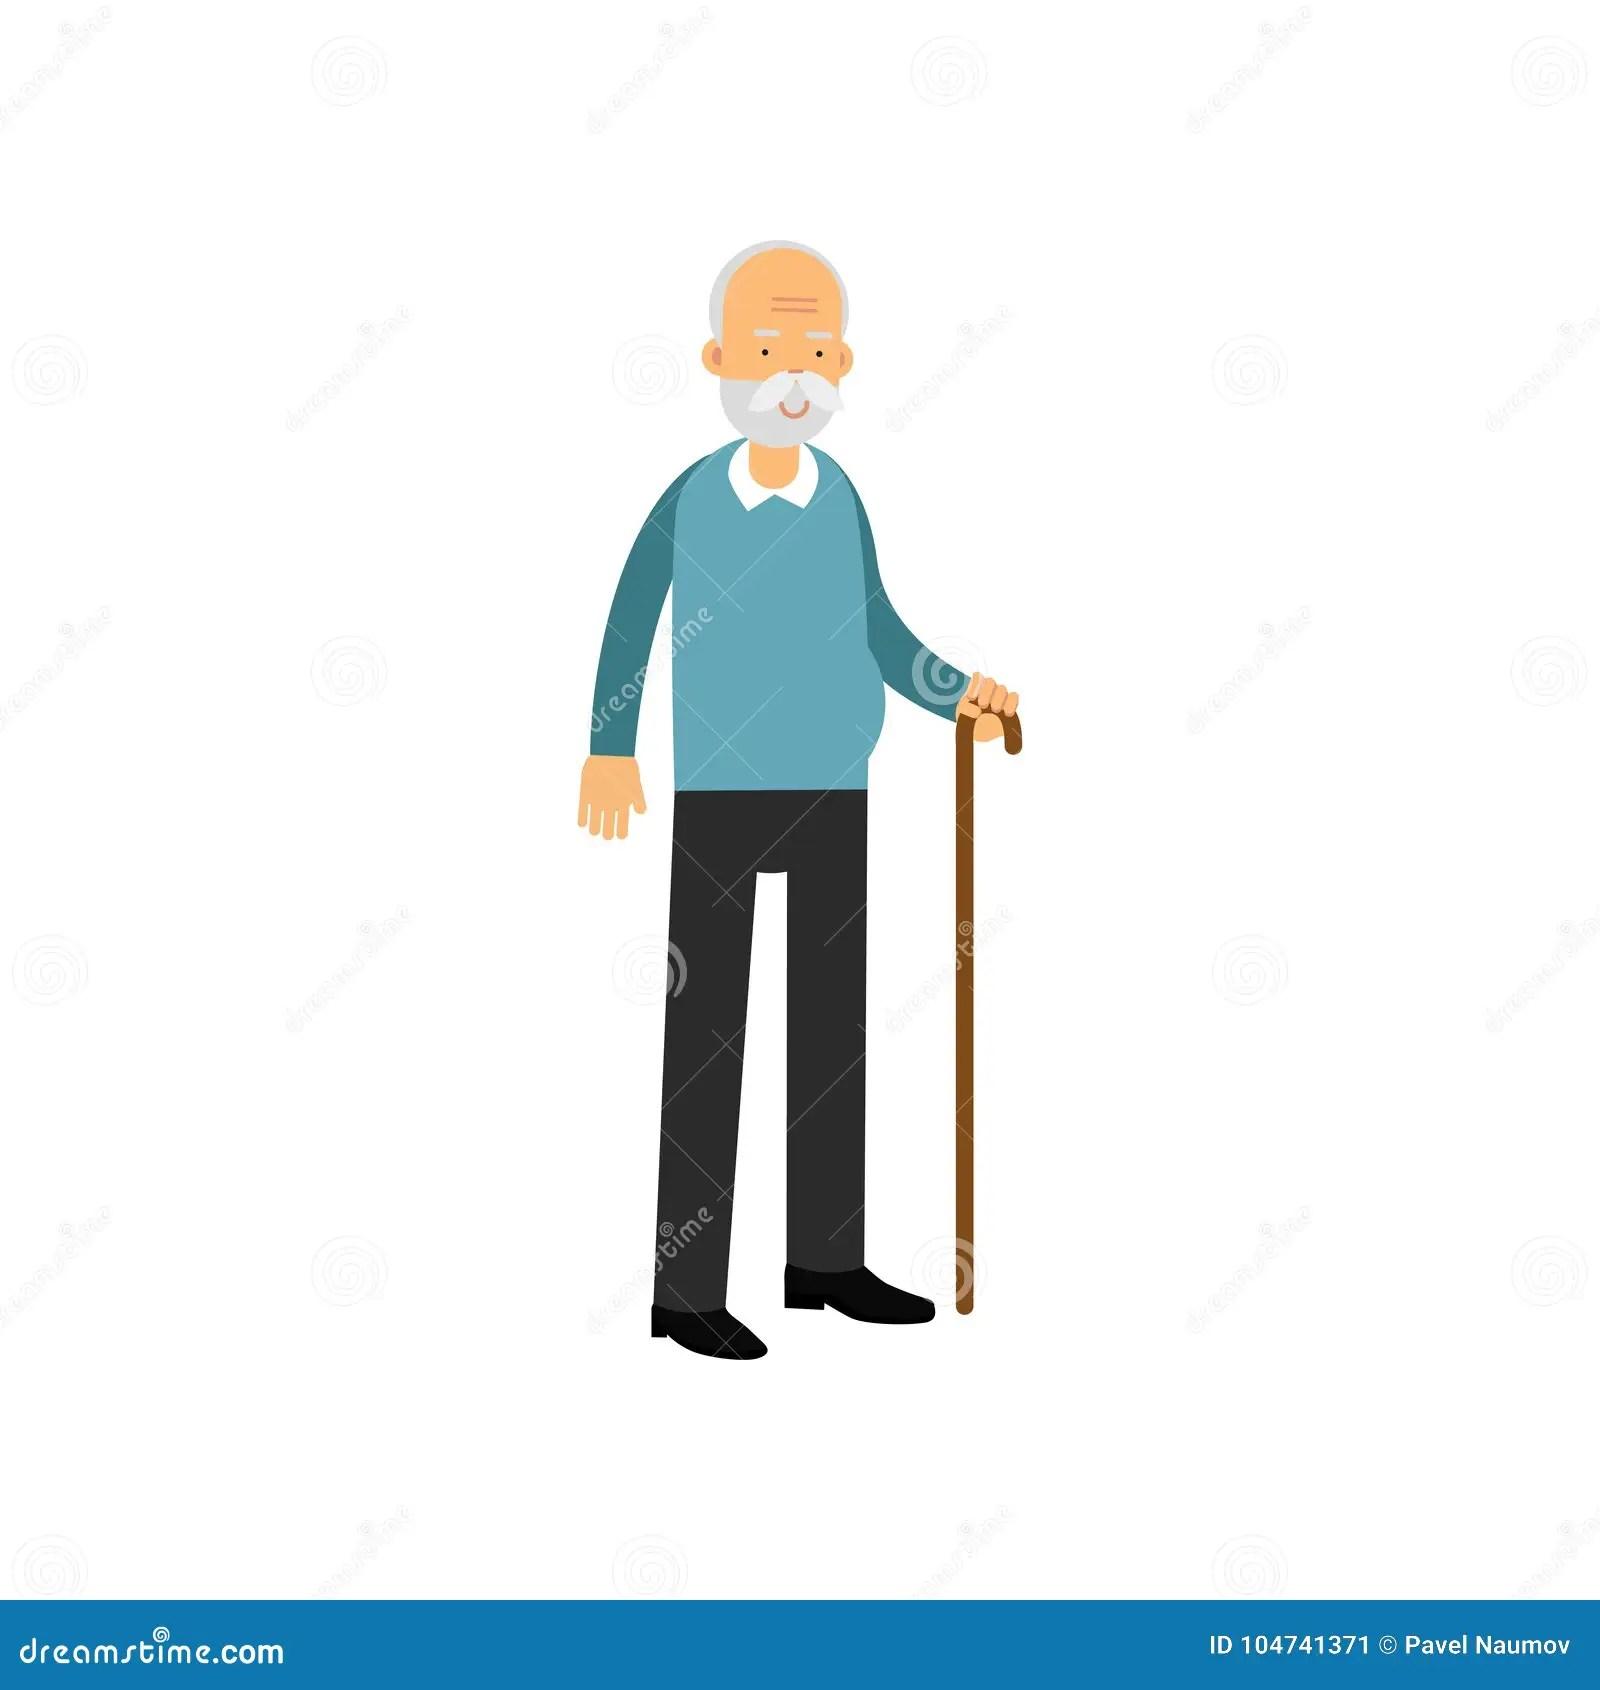 Pensioner Cartoons Illustrations Amp Vector Stock Images